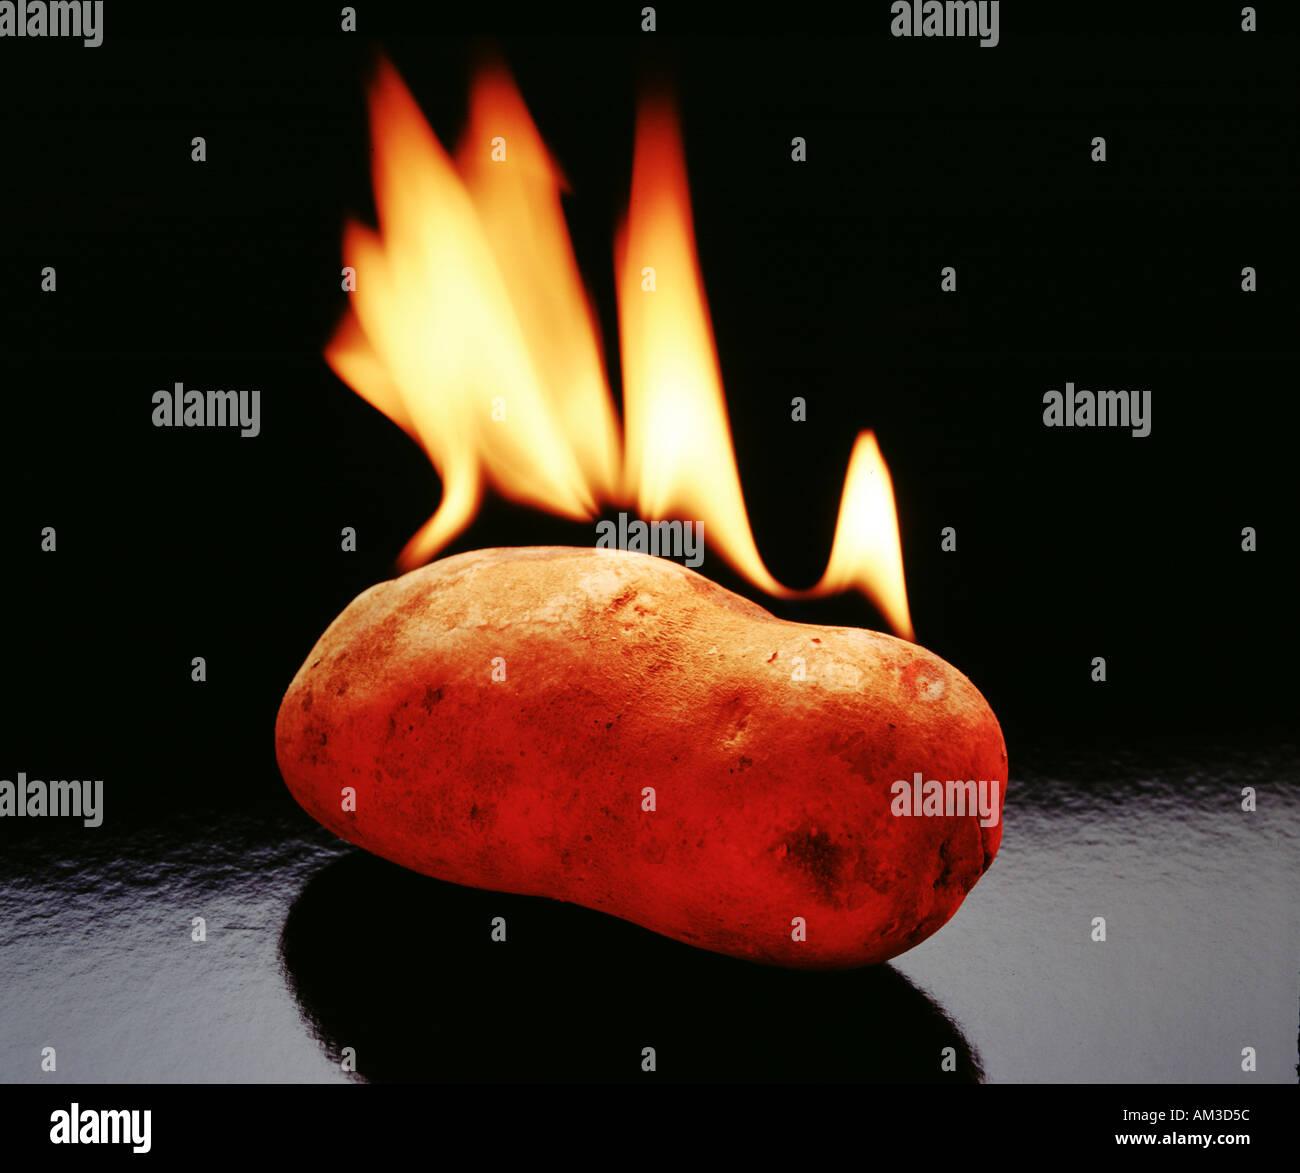 hot potato, potato on fire with flames - Stock Image